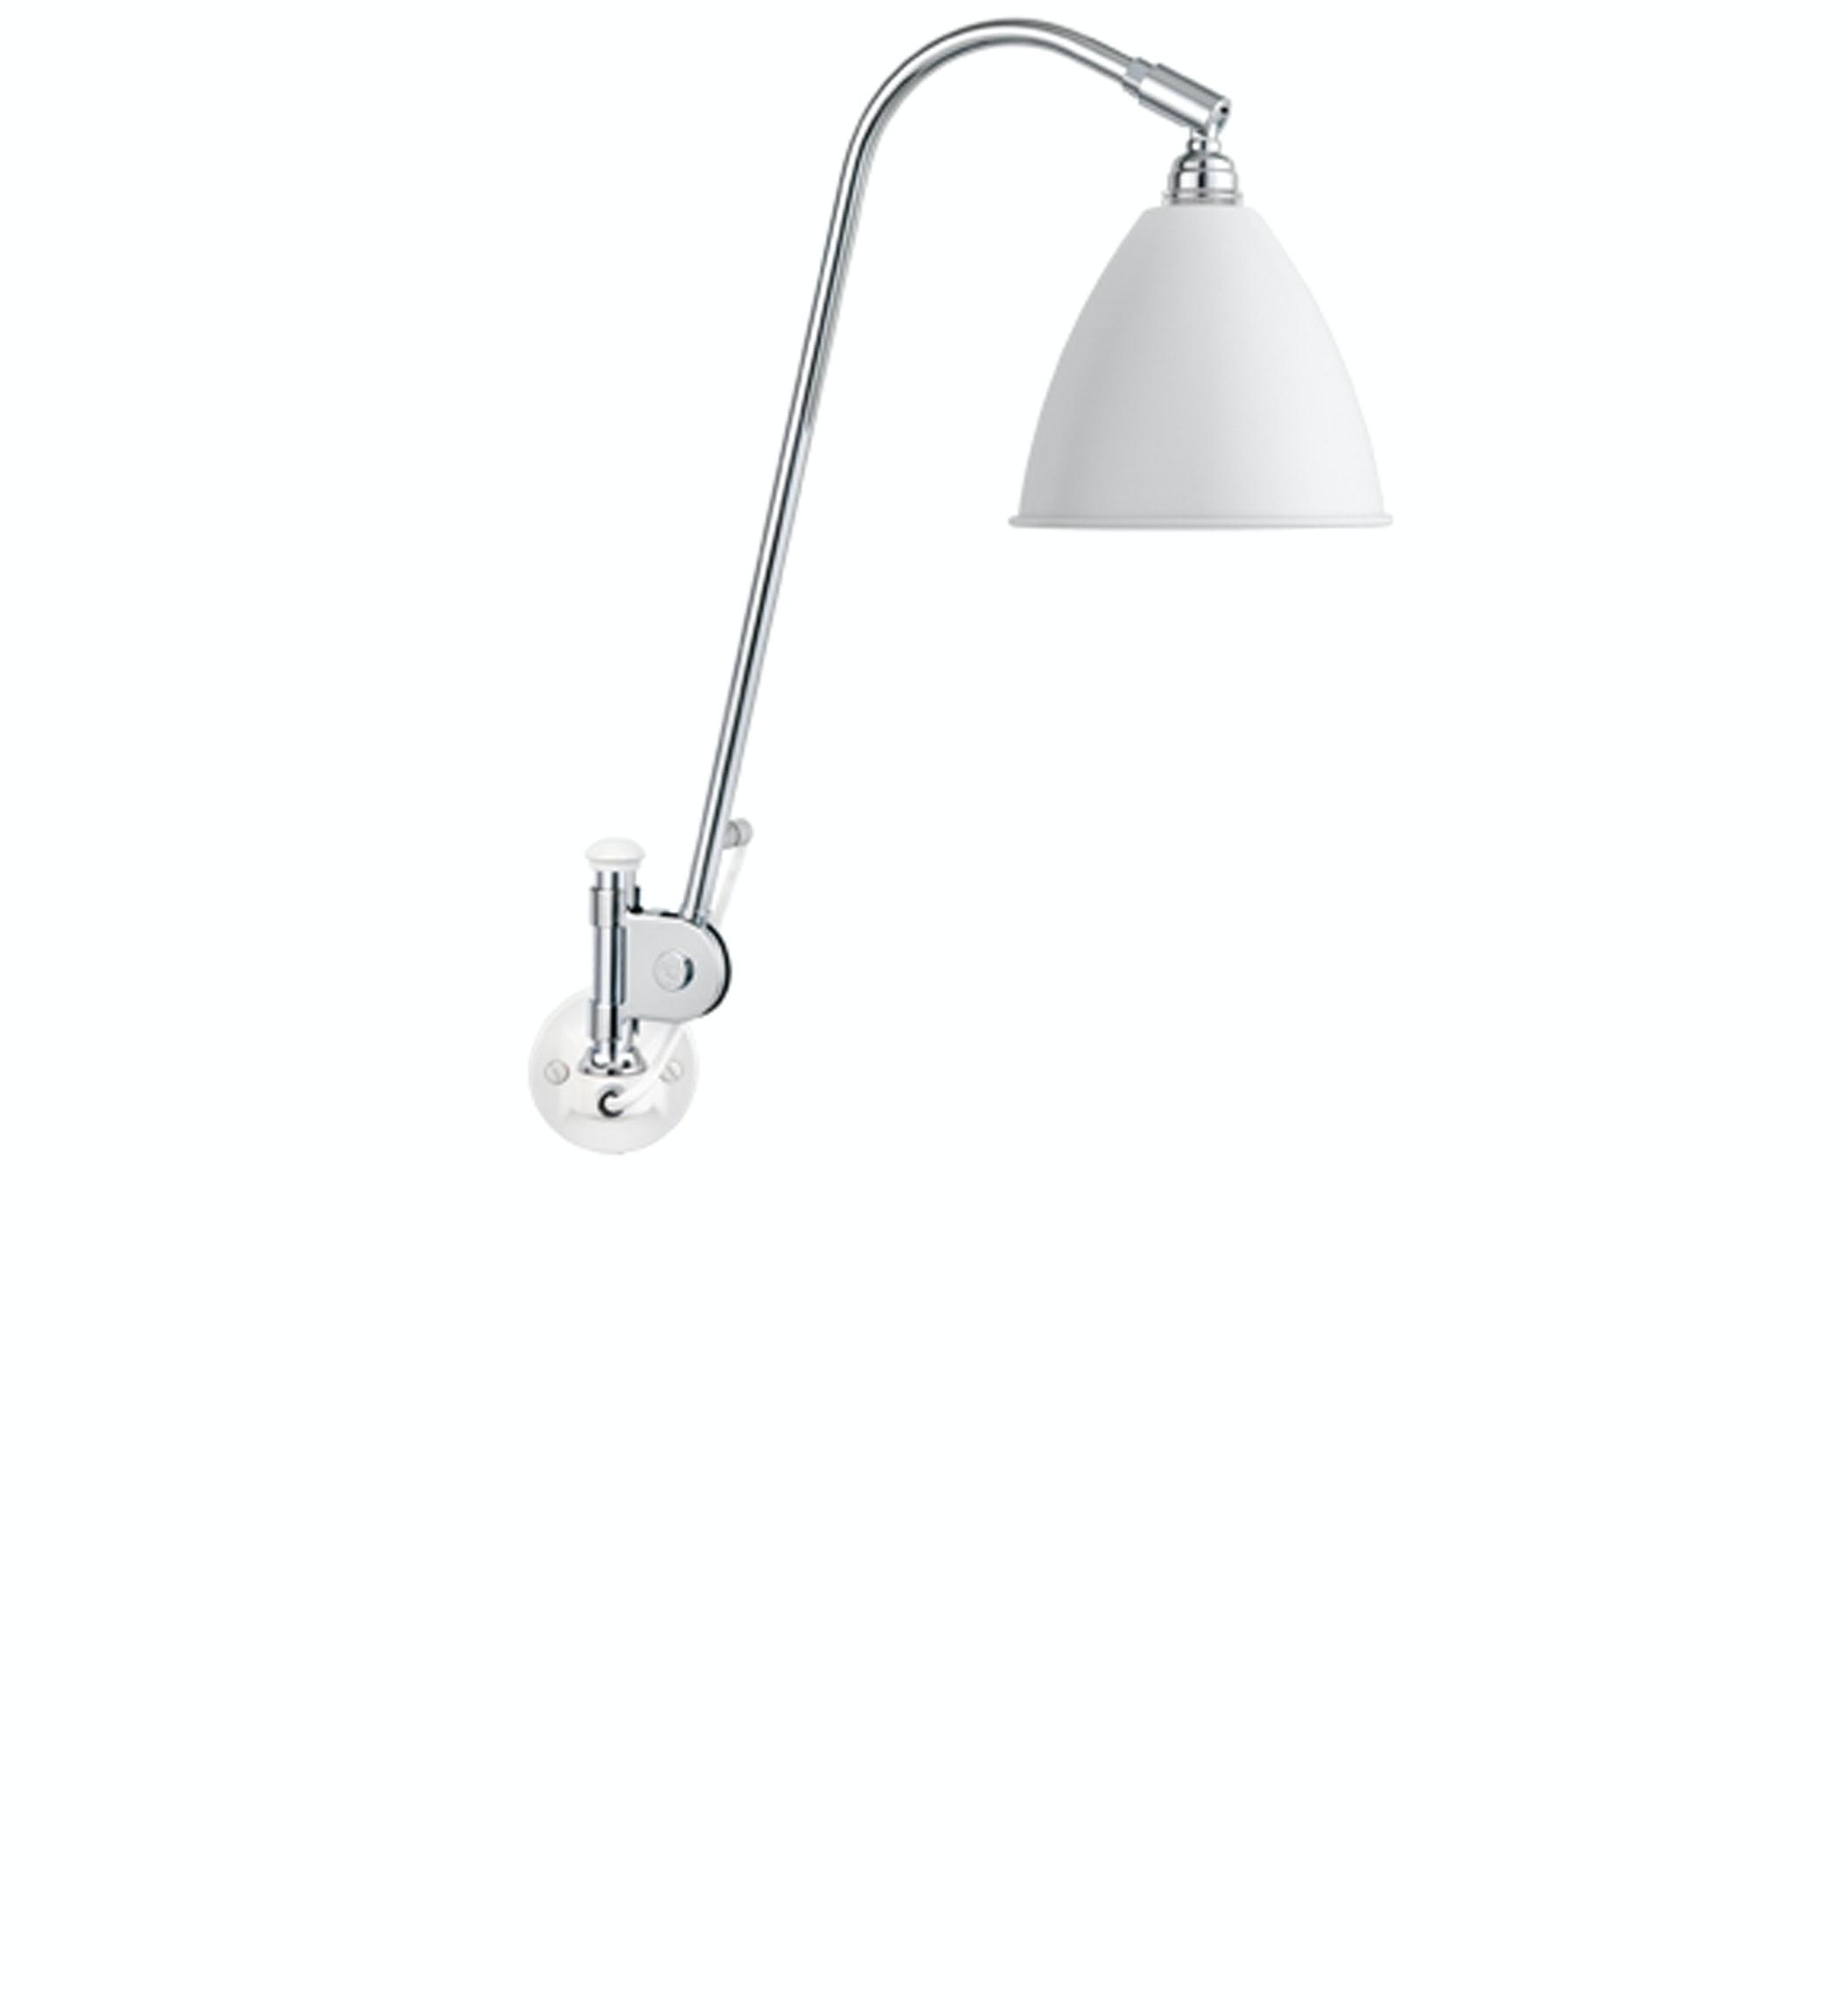 Bl6 Matt White Hardwired Product